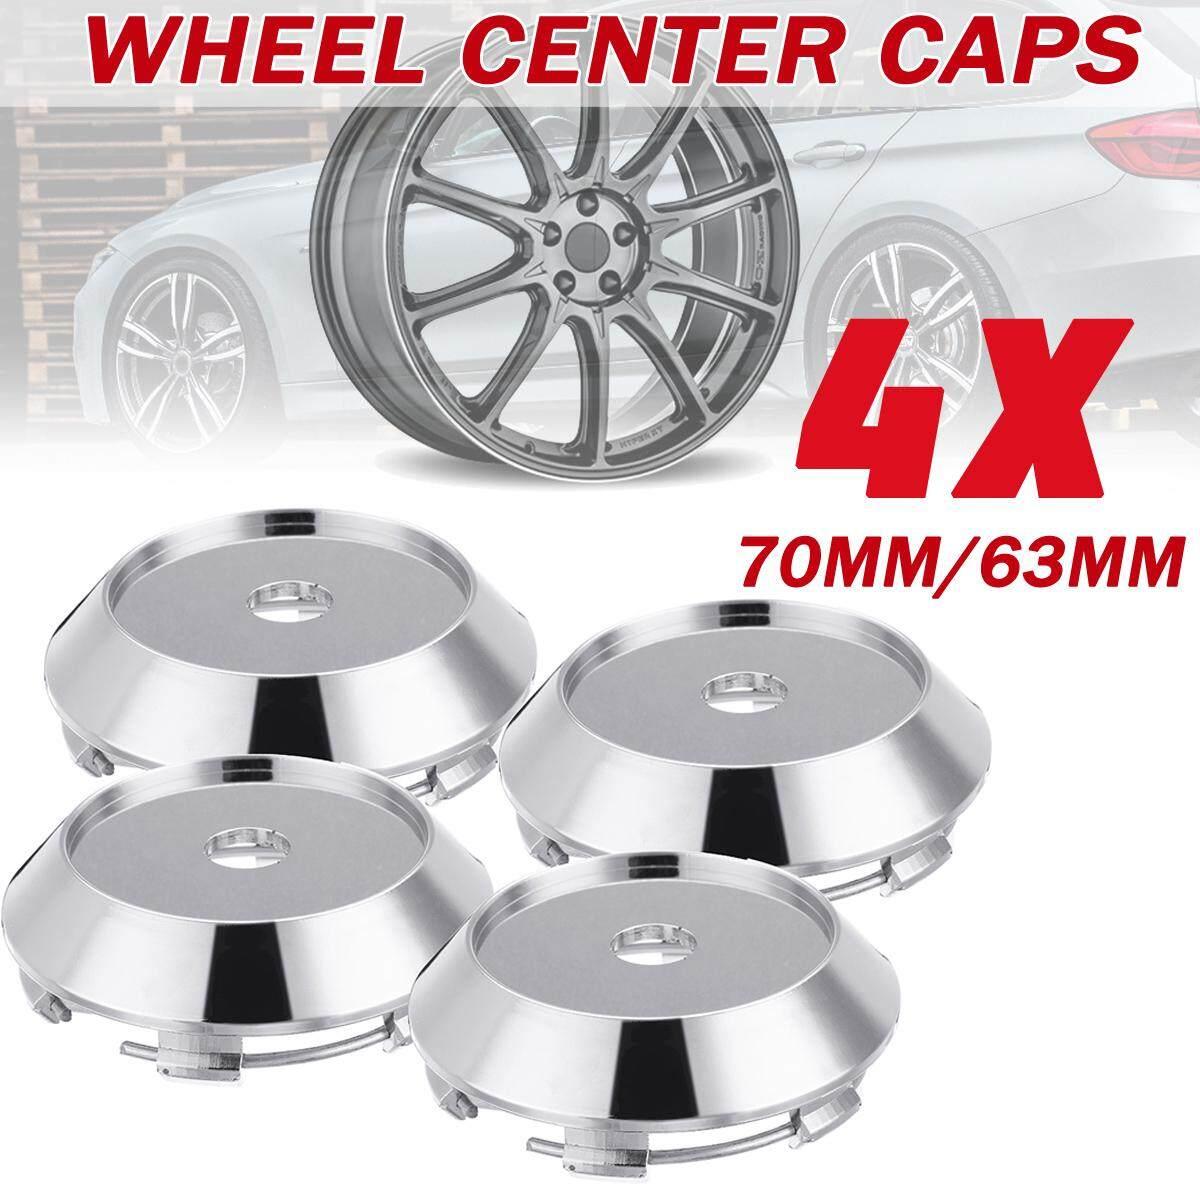 4pc Universal Chrome Car Wheel Center Rim Hub Cap Cover Decal Sticker 70mm/63mm By Elec Mall.